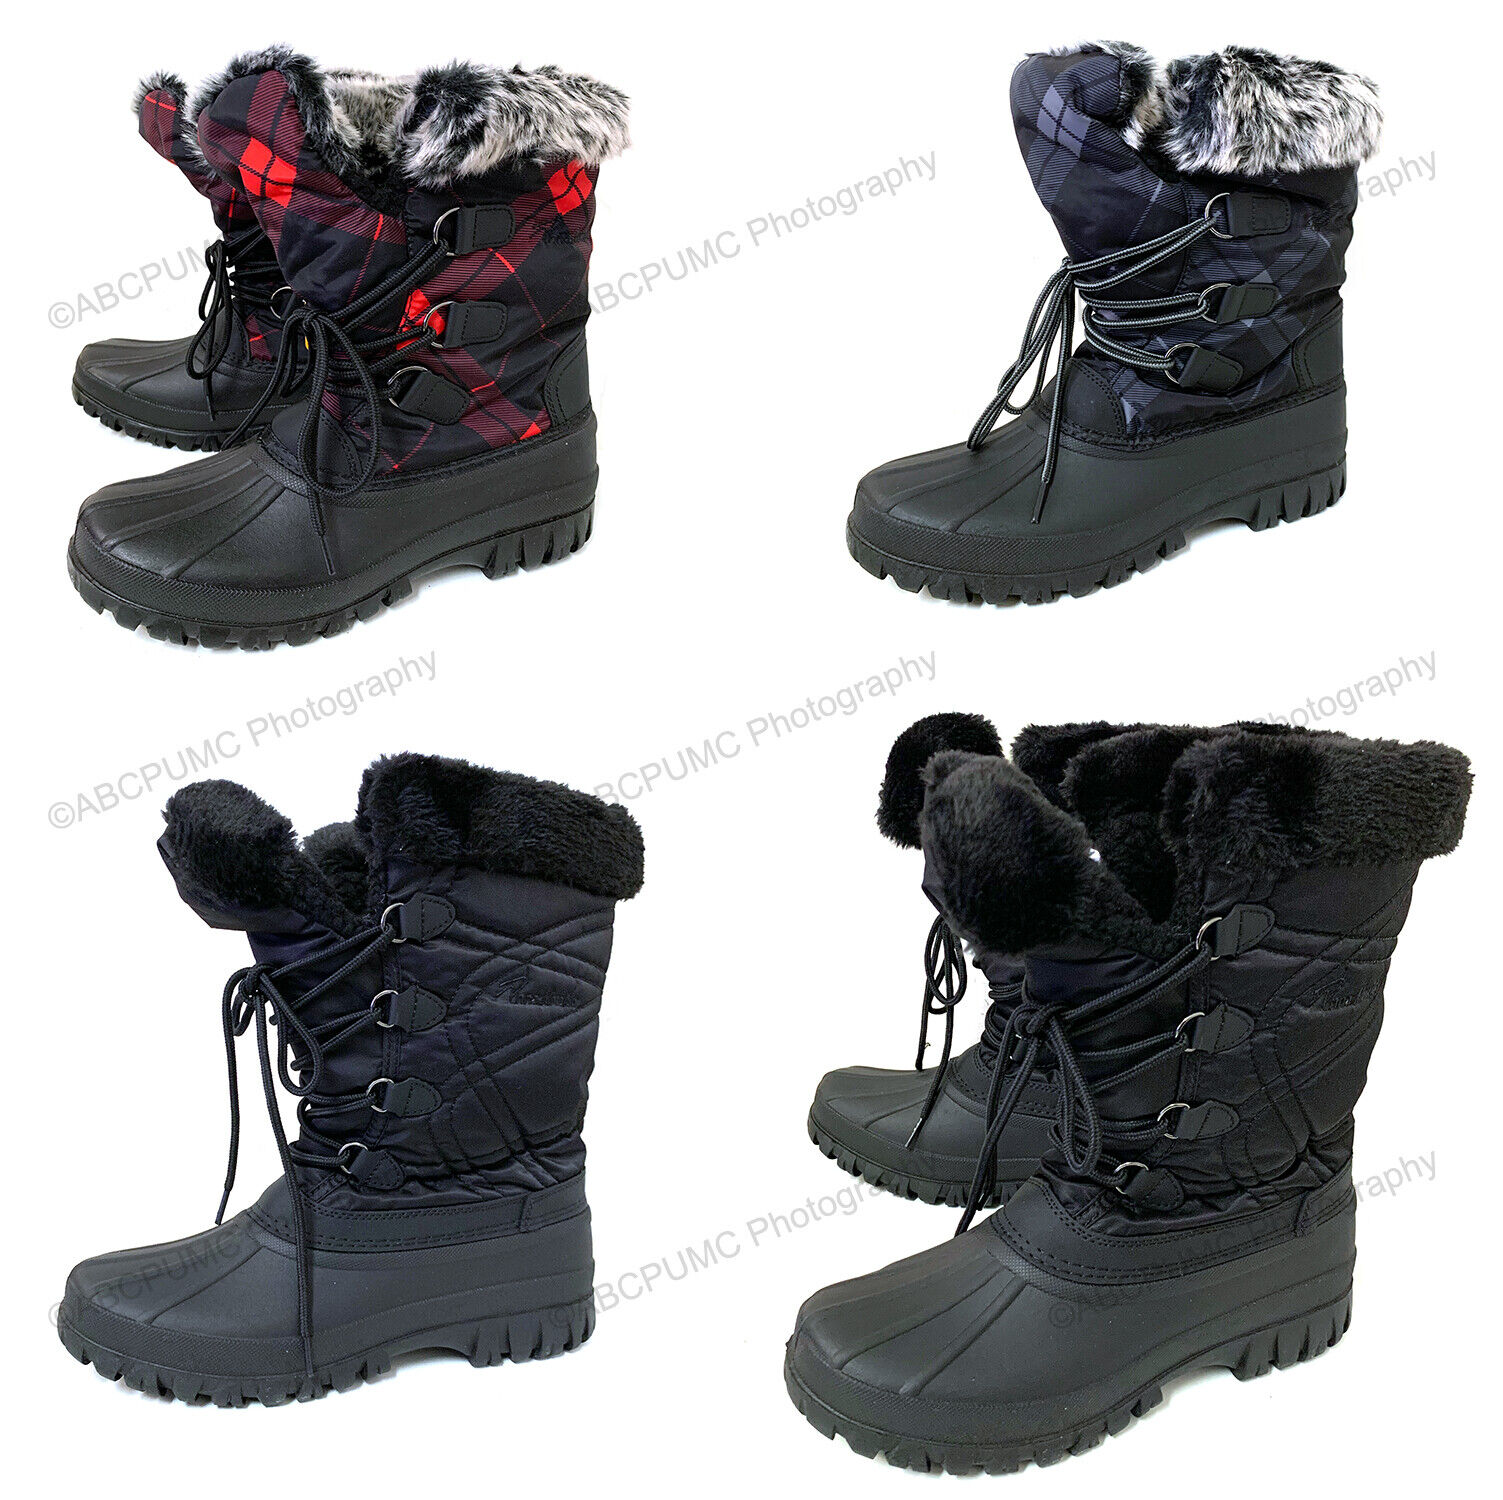 New Womens Snow Boots Fur Waterproof Warm Insulated Zipper W